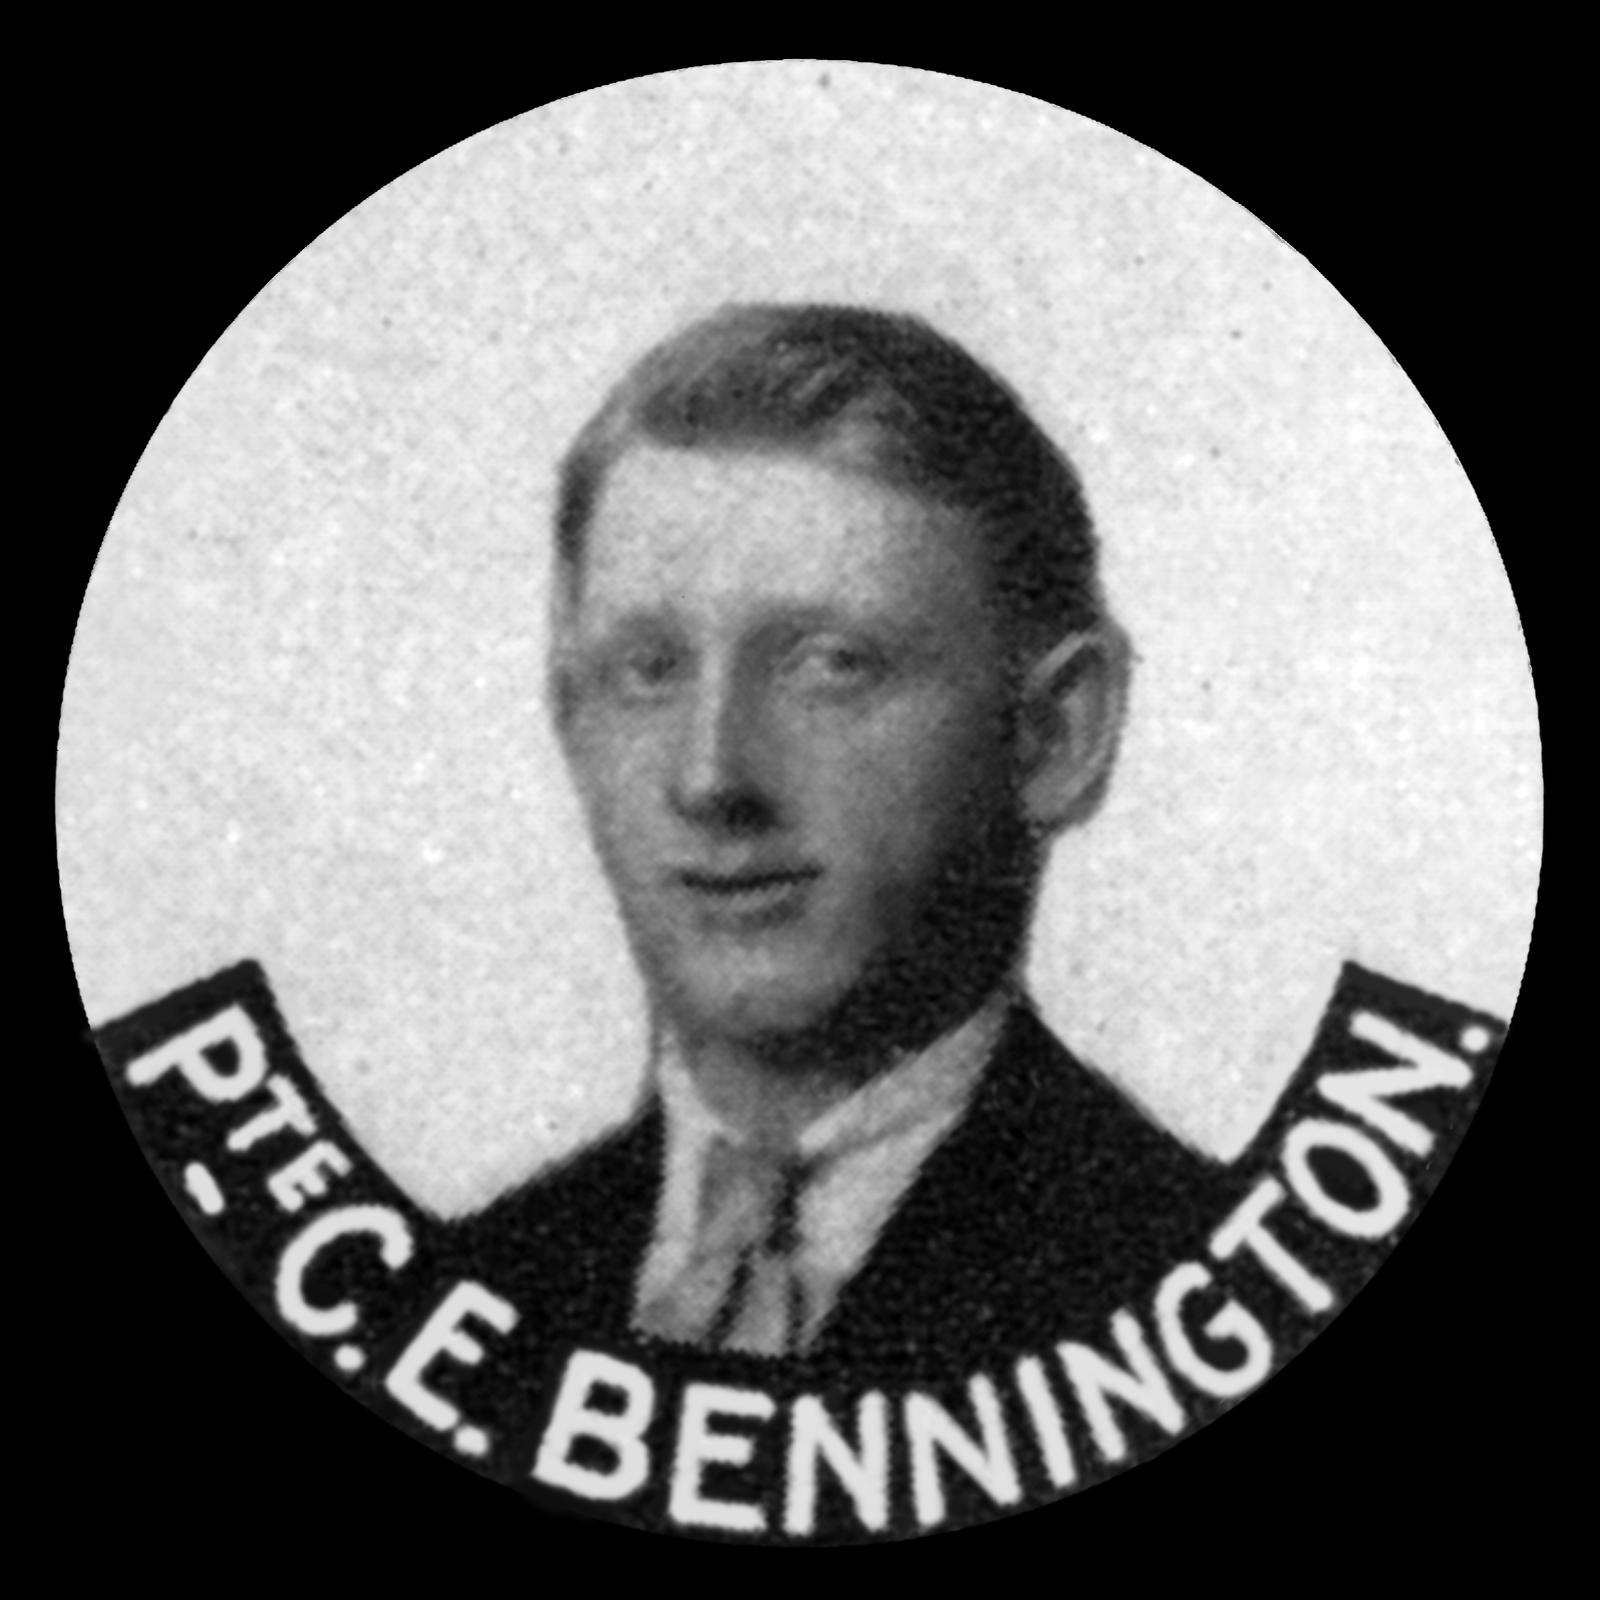 BENNINGTON Charles Edward